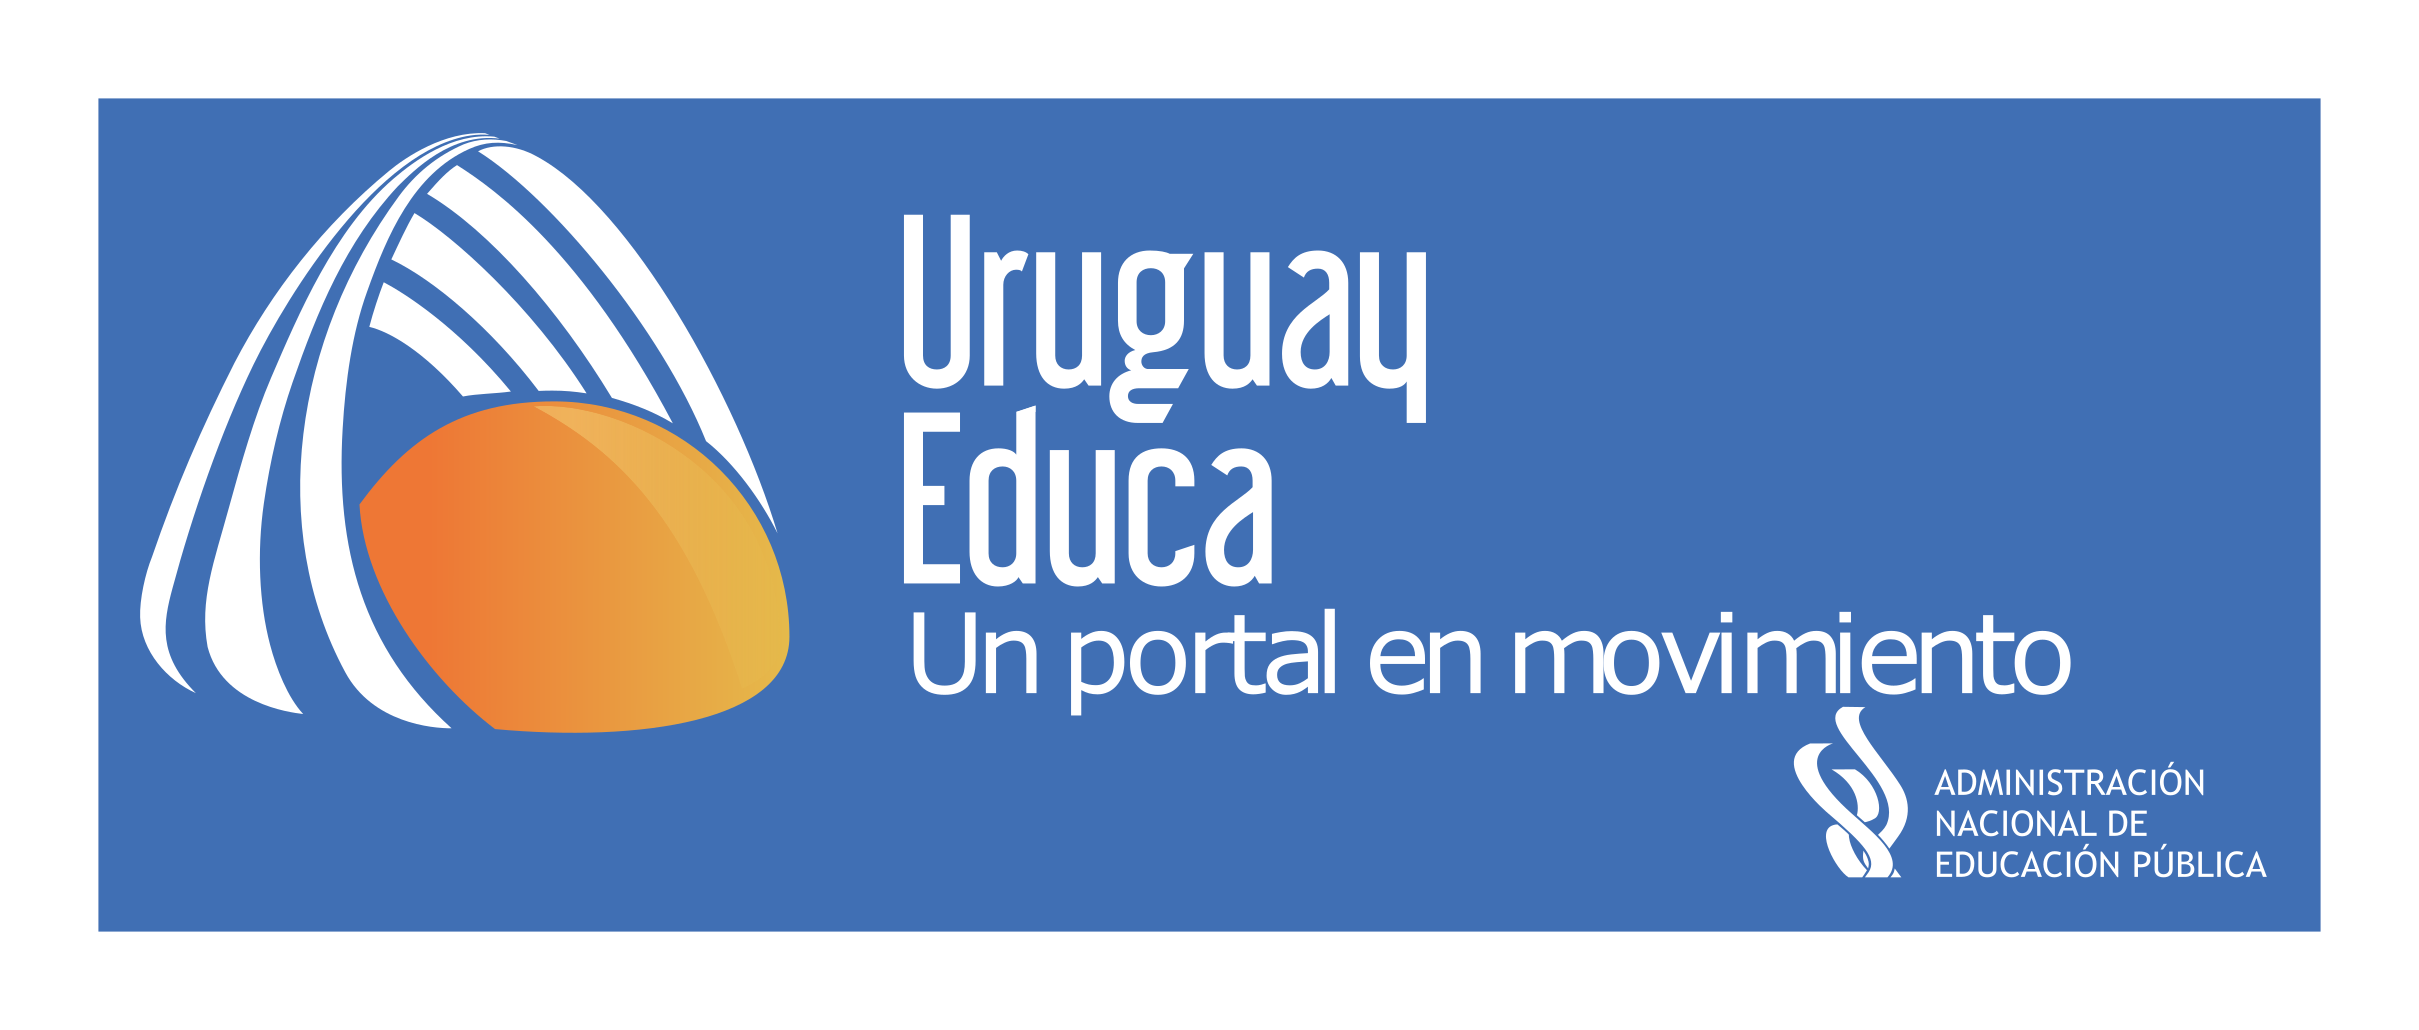 logotipo nueva etapa UruguayEduca